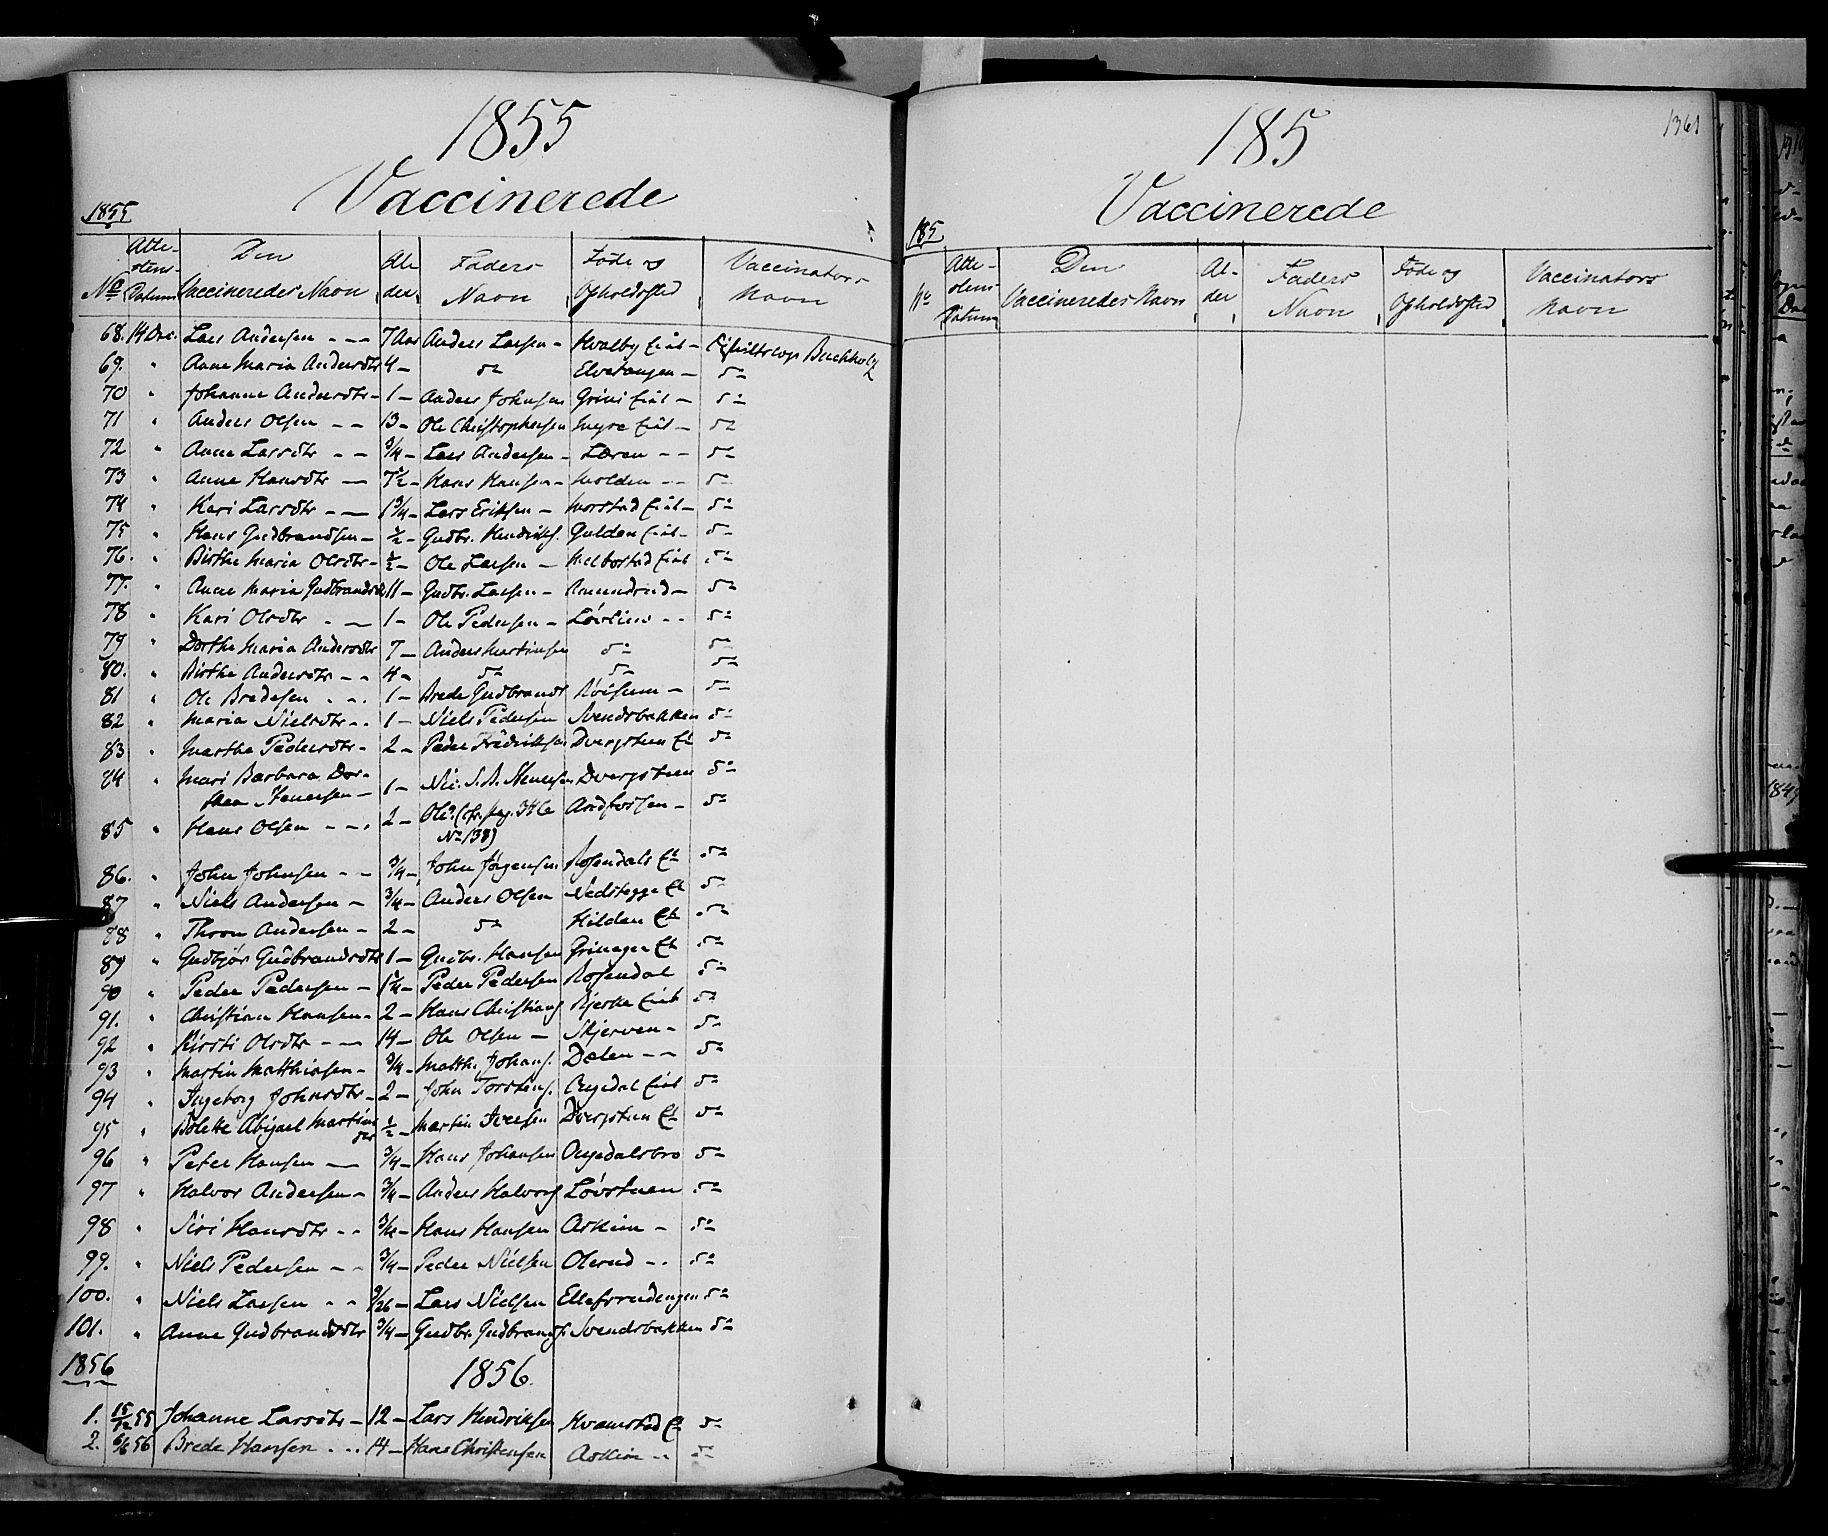 SAH, Gran prestekontor, Ministerialbok nr. 11, 1842-1856, s. 1360-1361